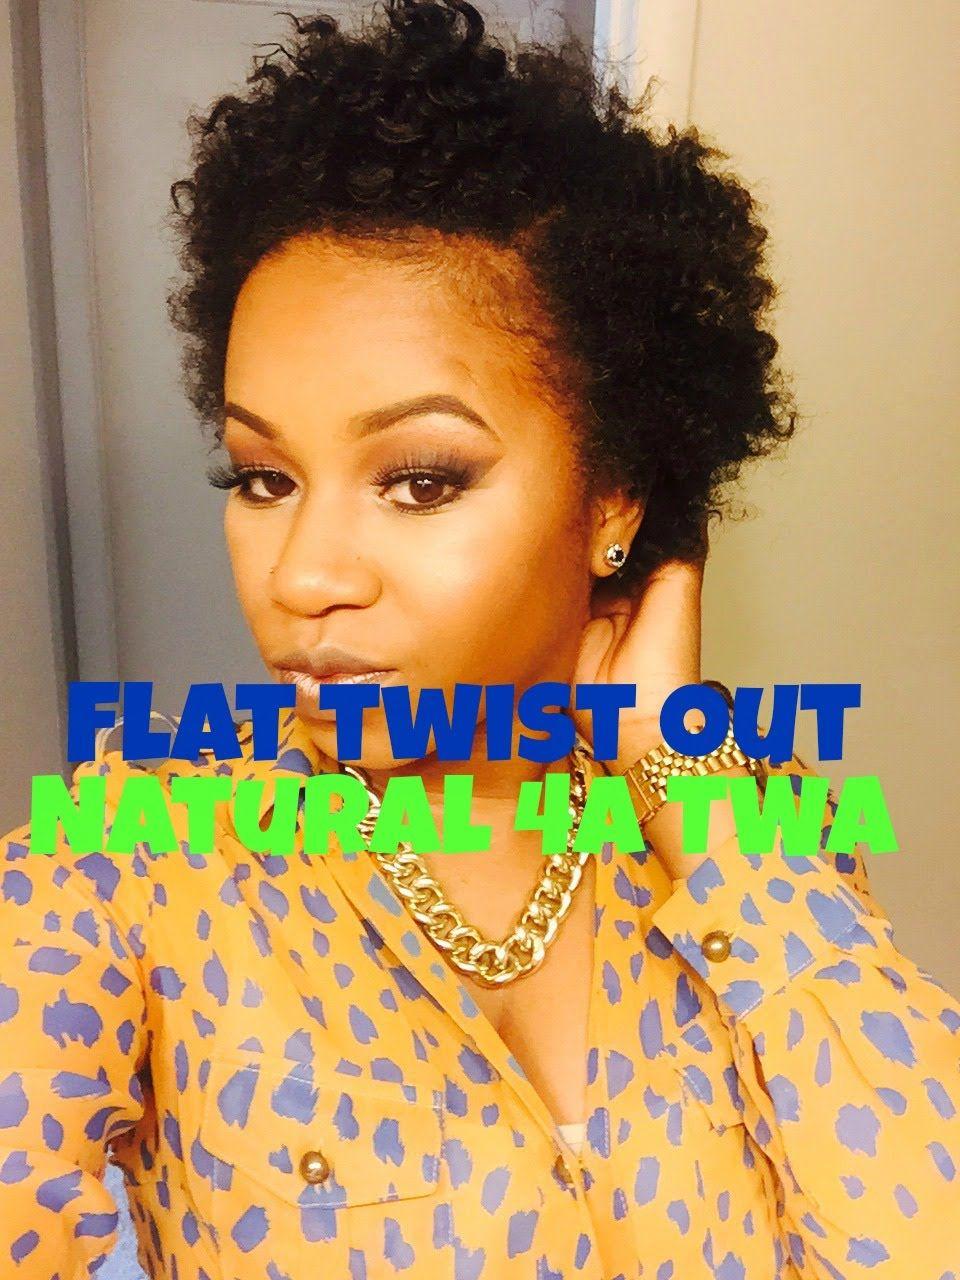 Flat Twist Out On Short 4a Natural Hair Tella Glam Natural Hair Styles Twist Outs Short Hair Styles